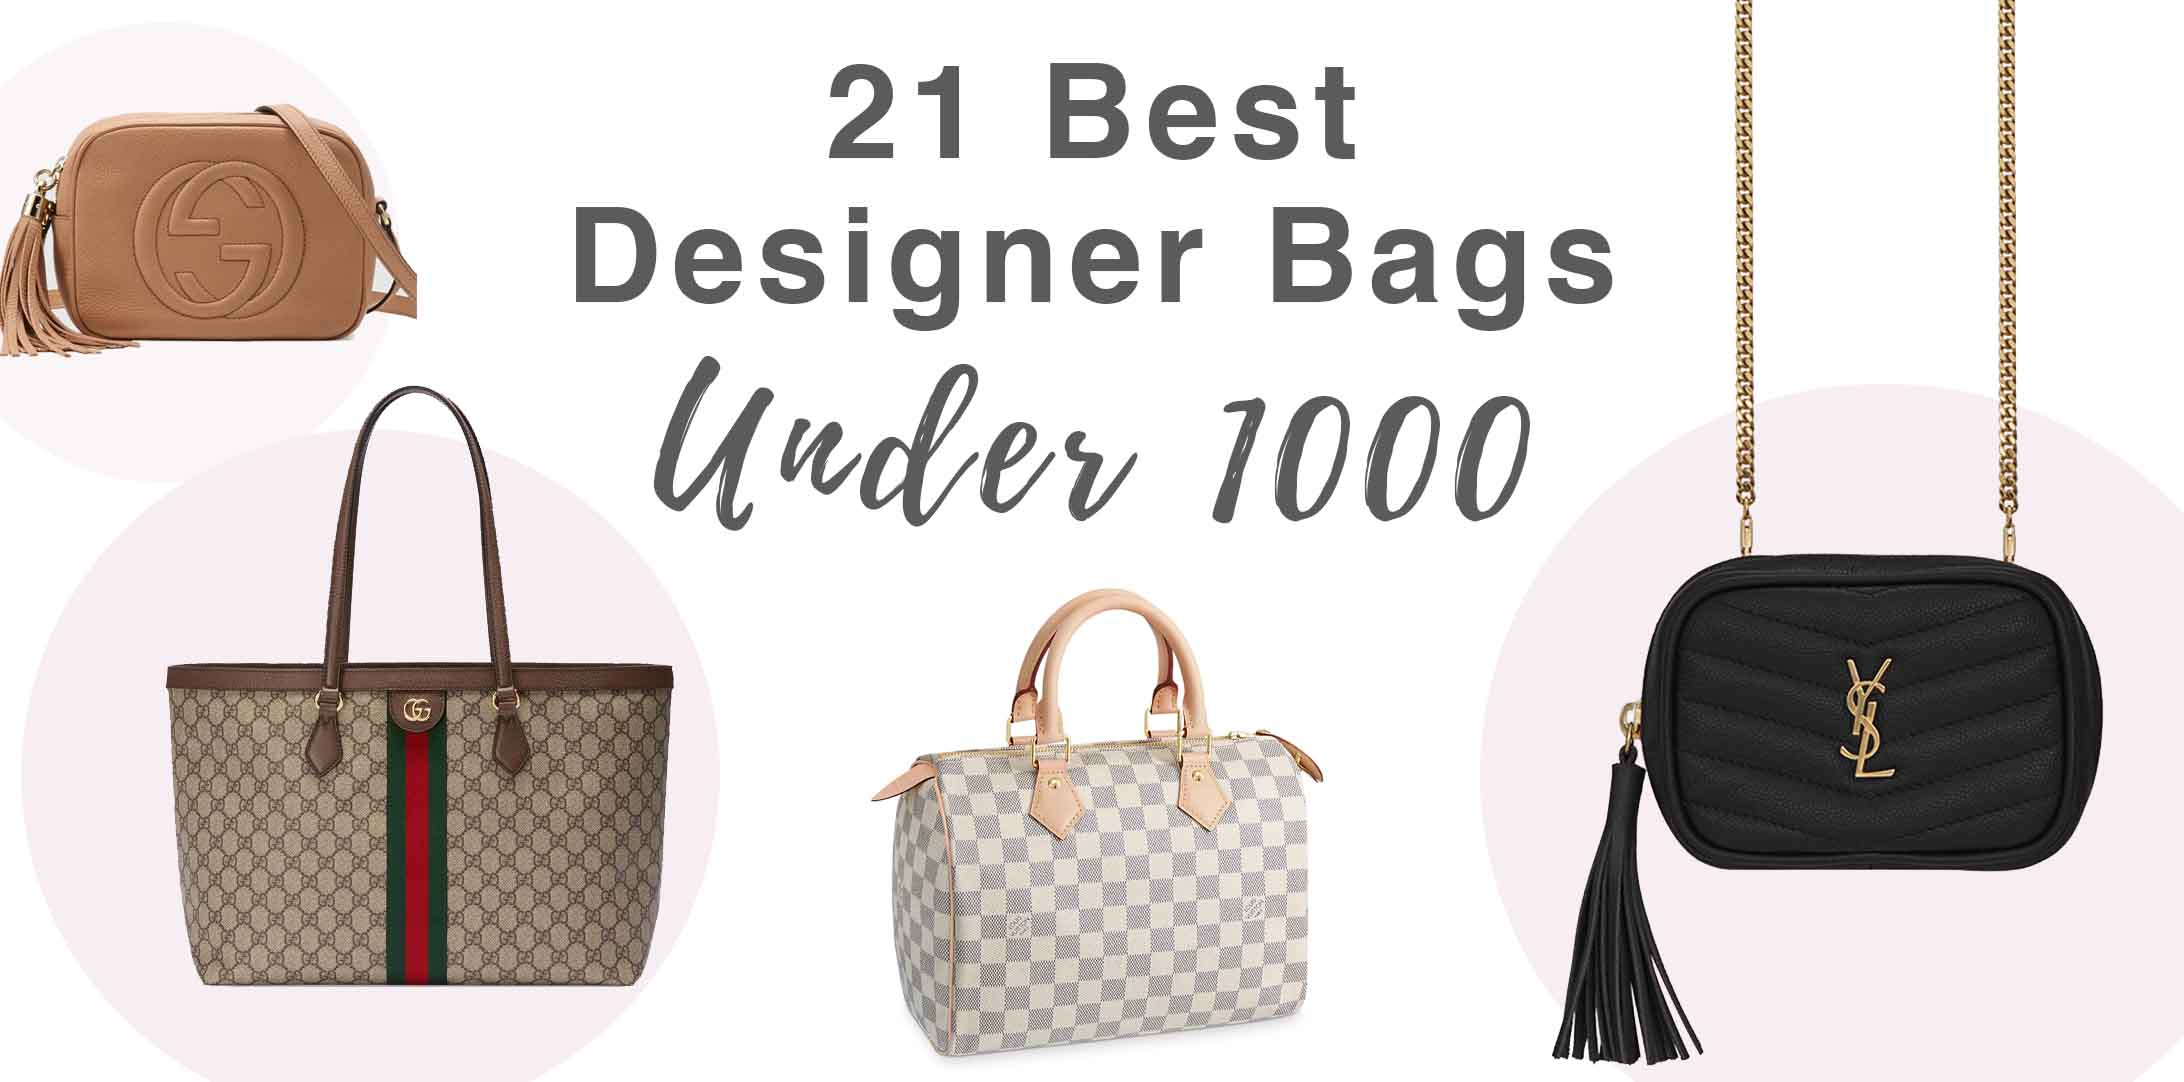 The 21 best designer bags under 1000 thumbnail